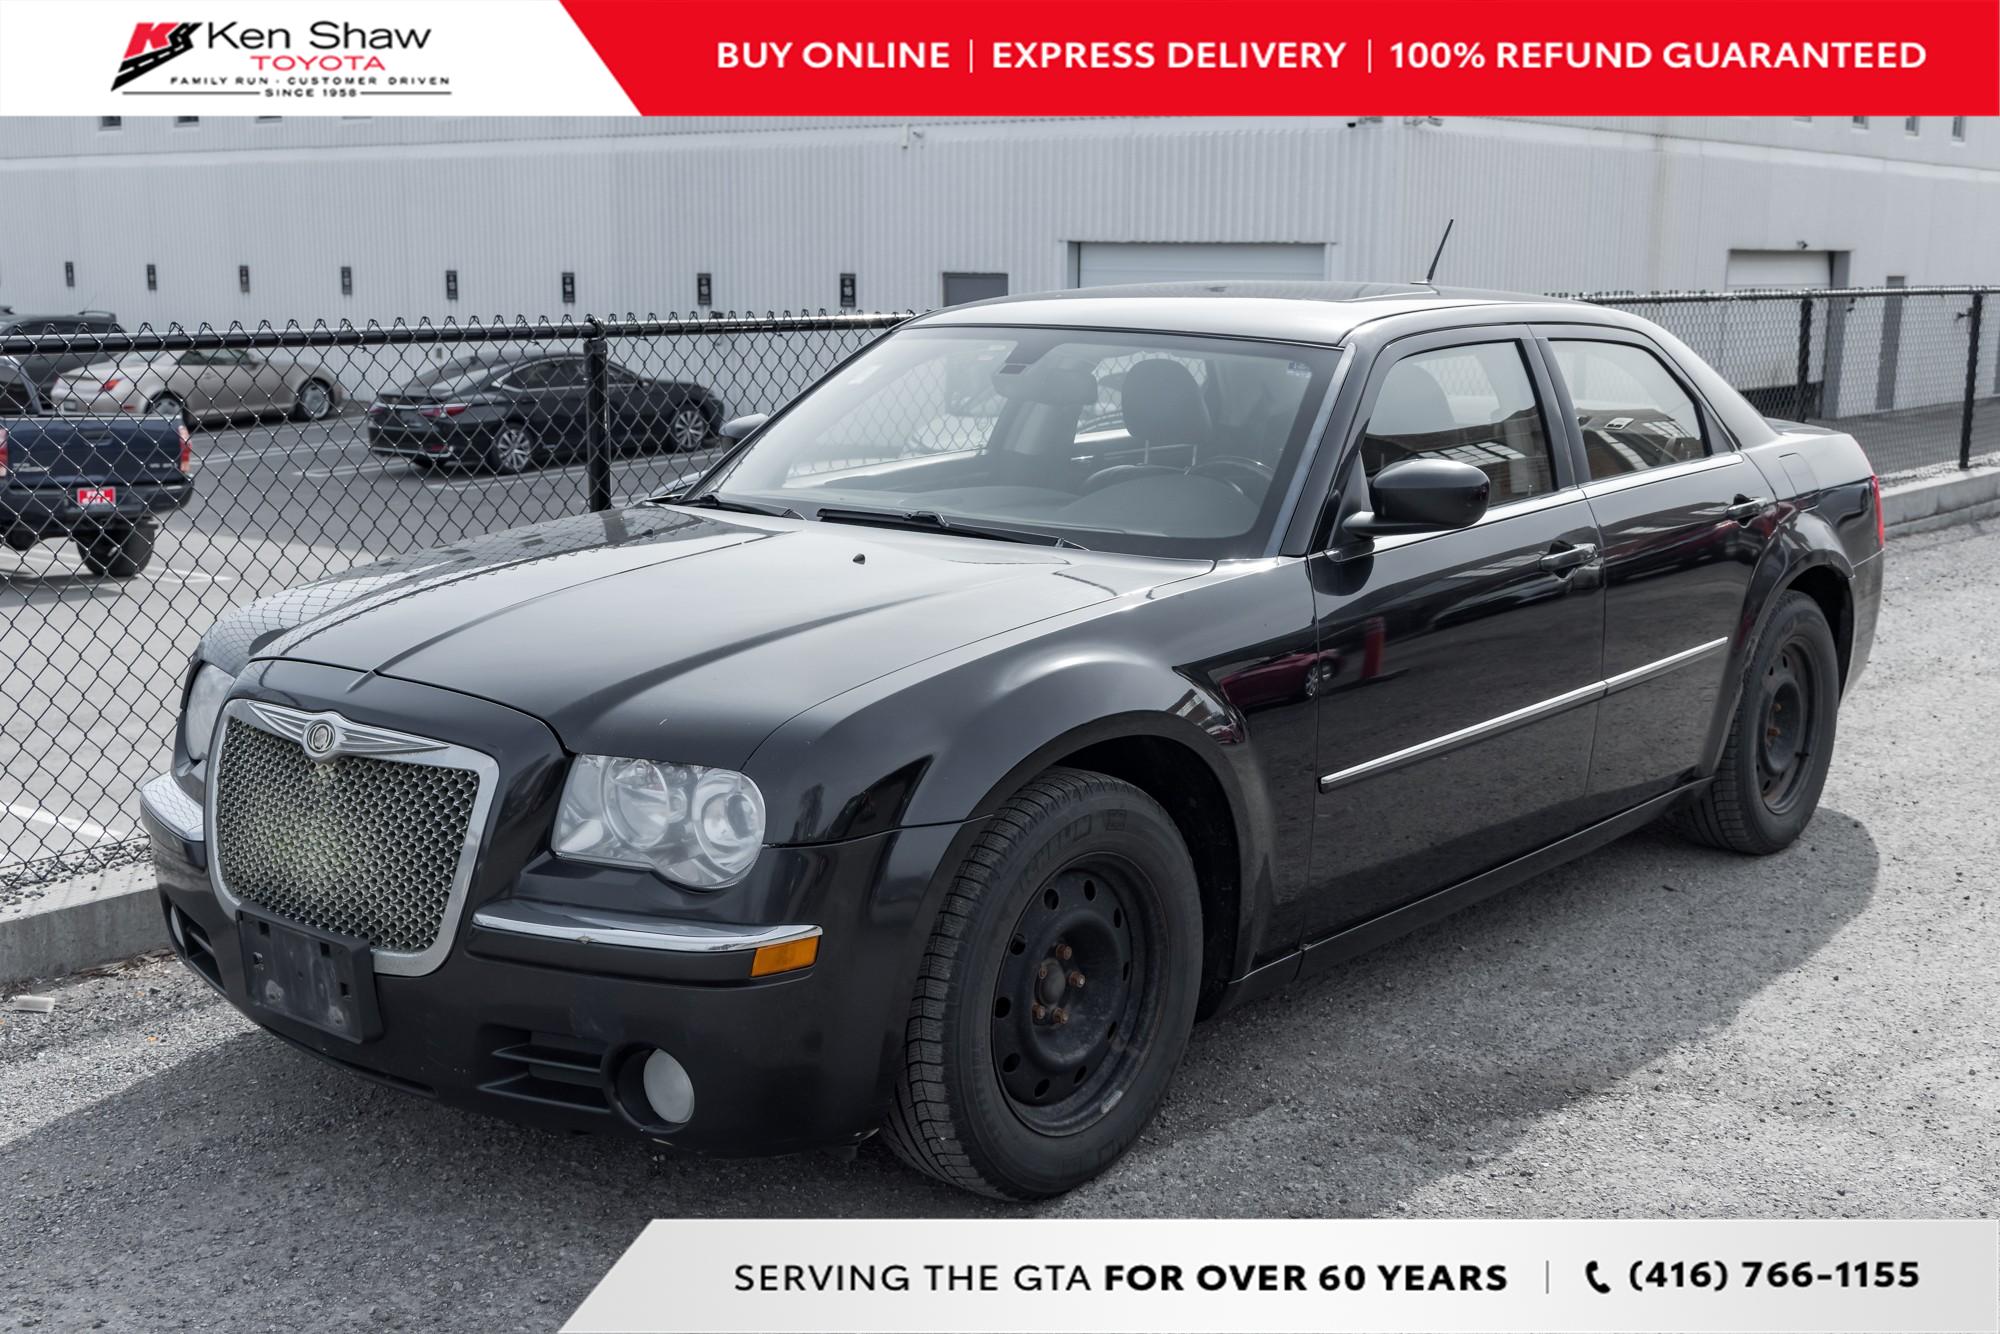 used 2008 Chrysler 300 car, priced at $3,488